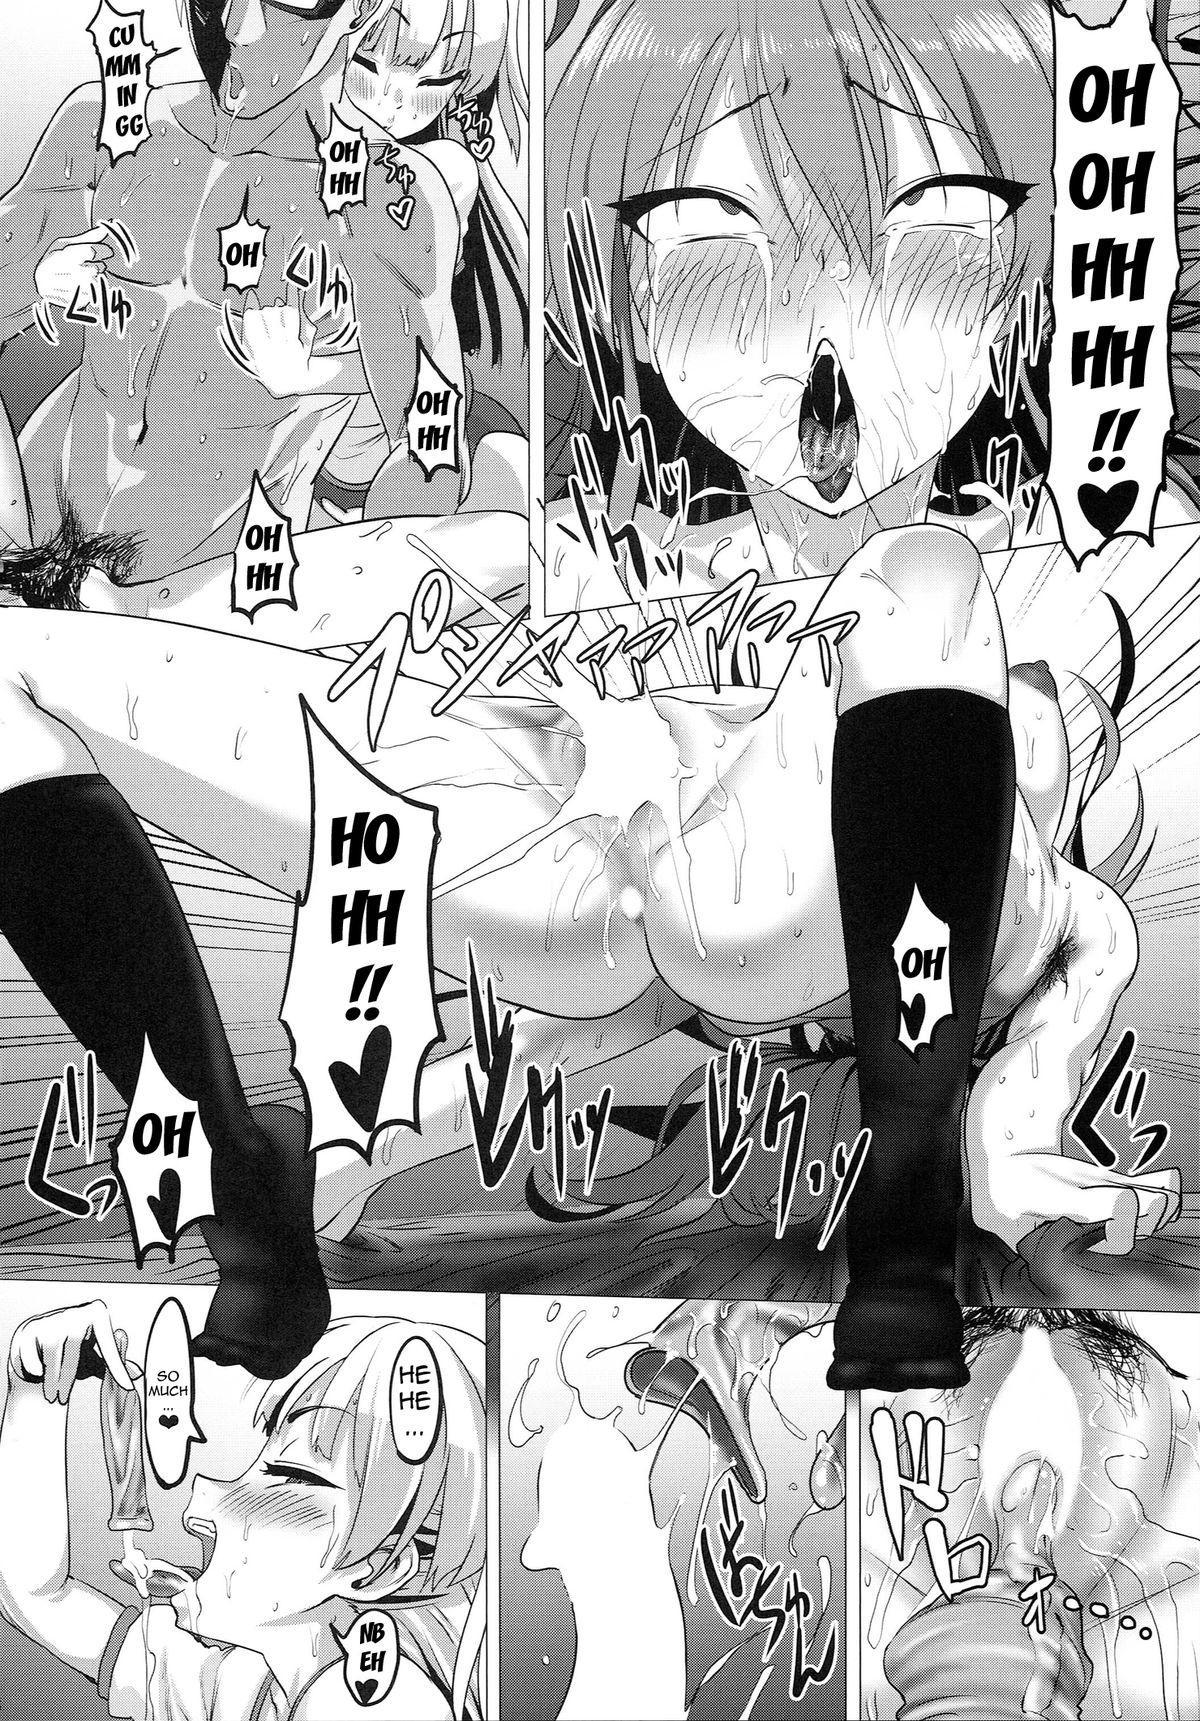 TOKIMEKI Enkou RHYTHM | TOKIMEKI Prostitution RHYTHM 16